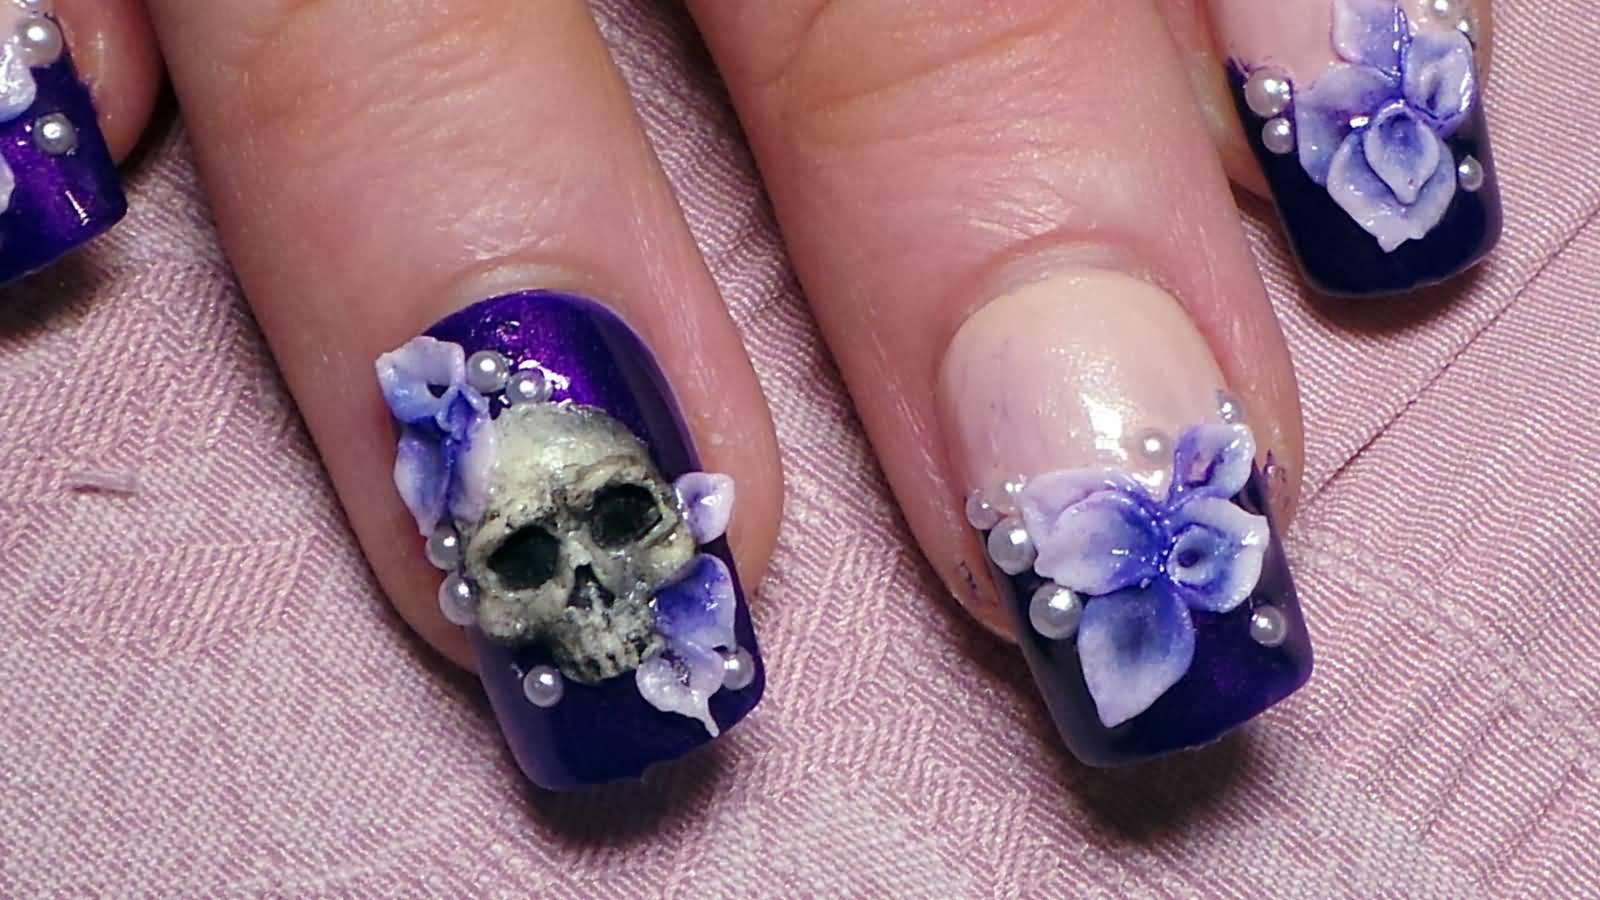 3d Skull And Flowers Nail Art Design Idea